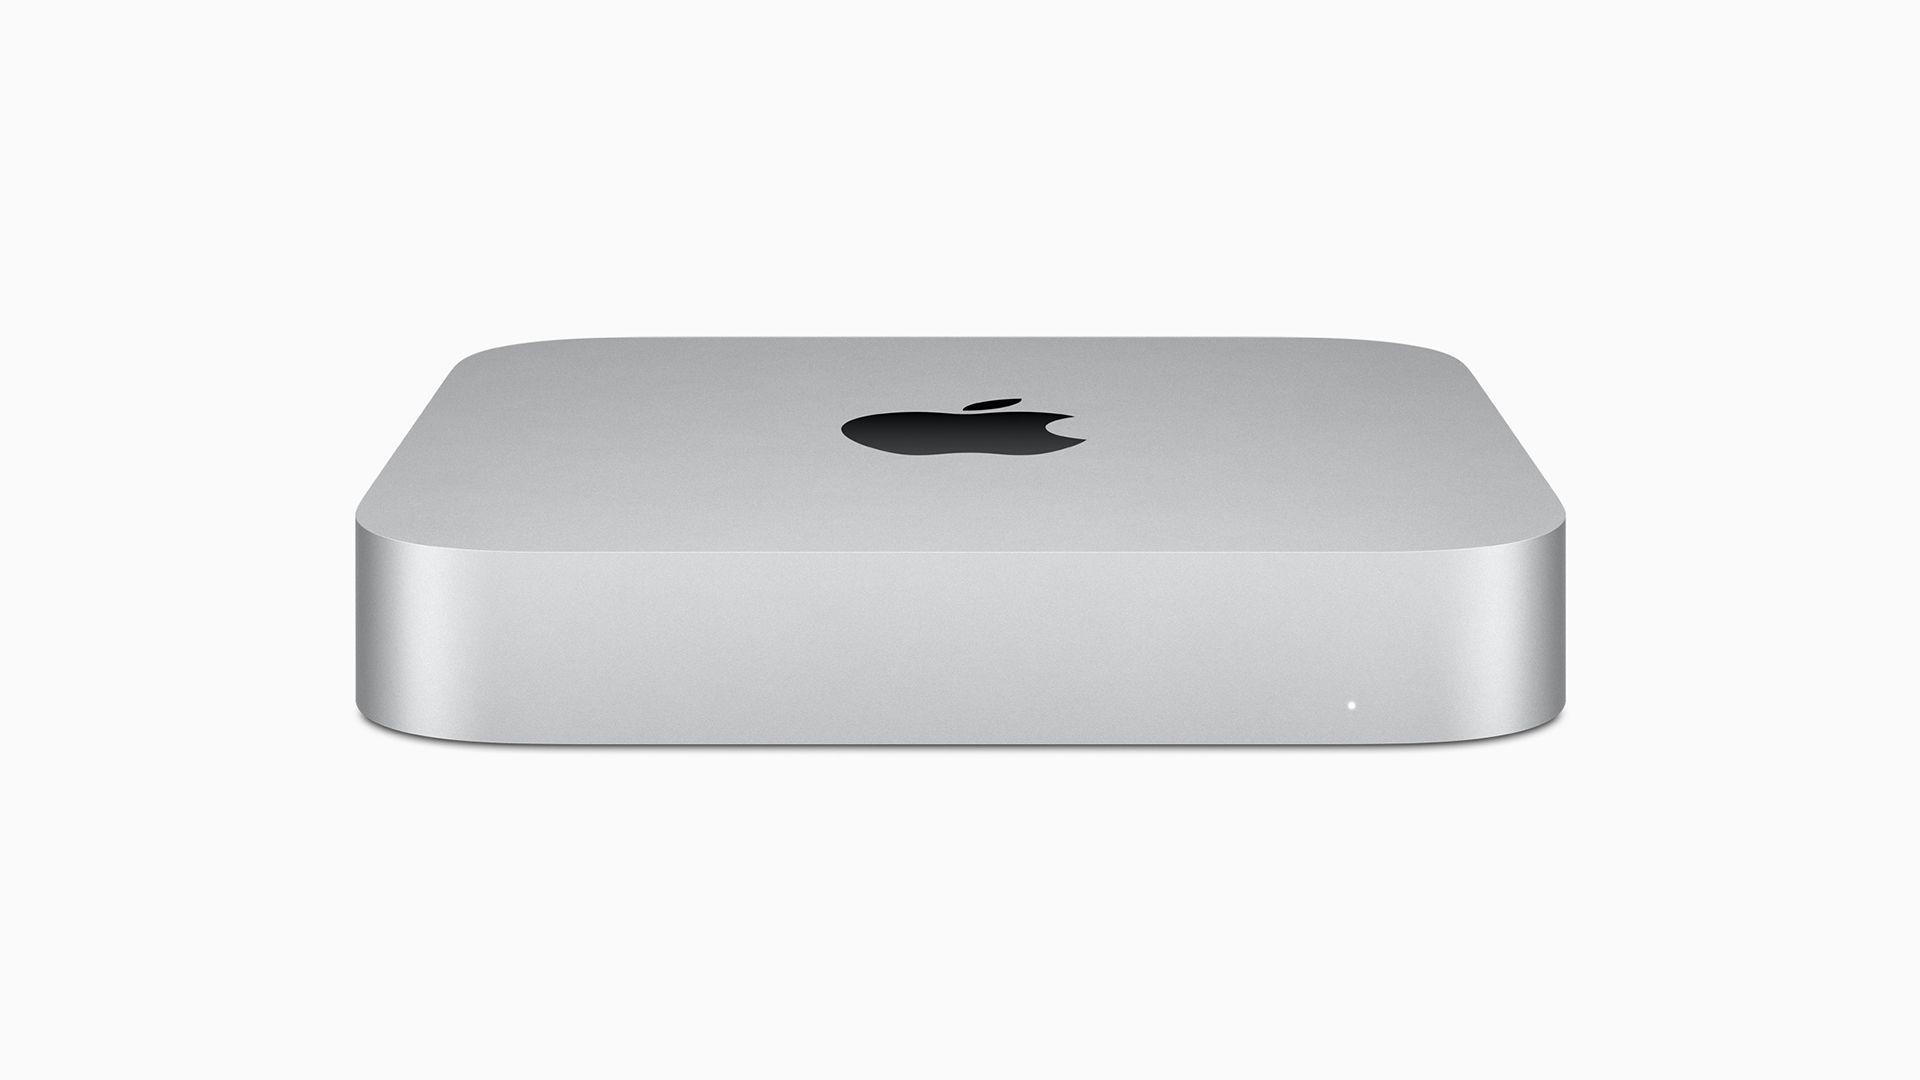 Mac Mini com Apple M1. (Foto: Divulgação/Apple)